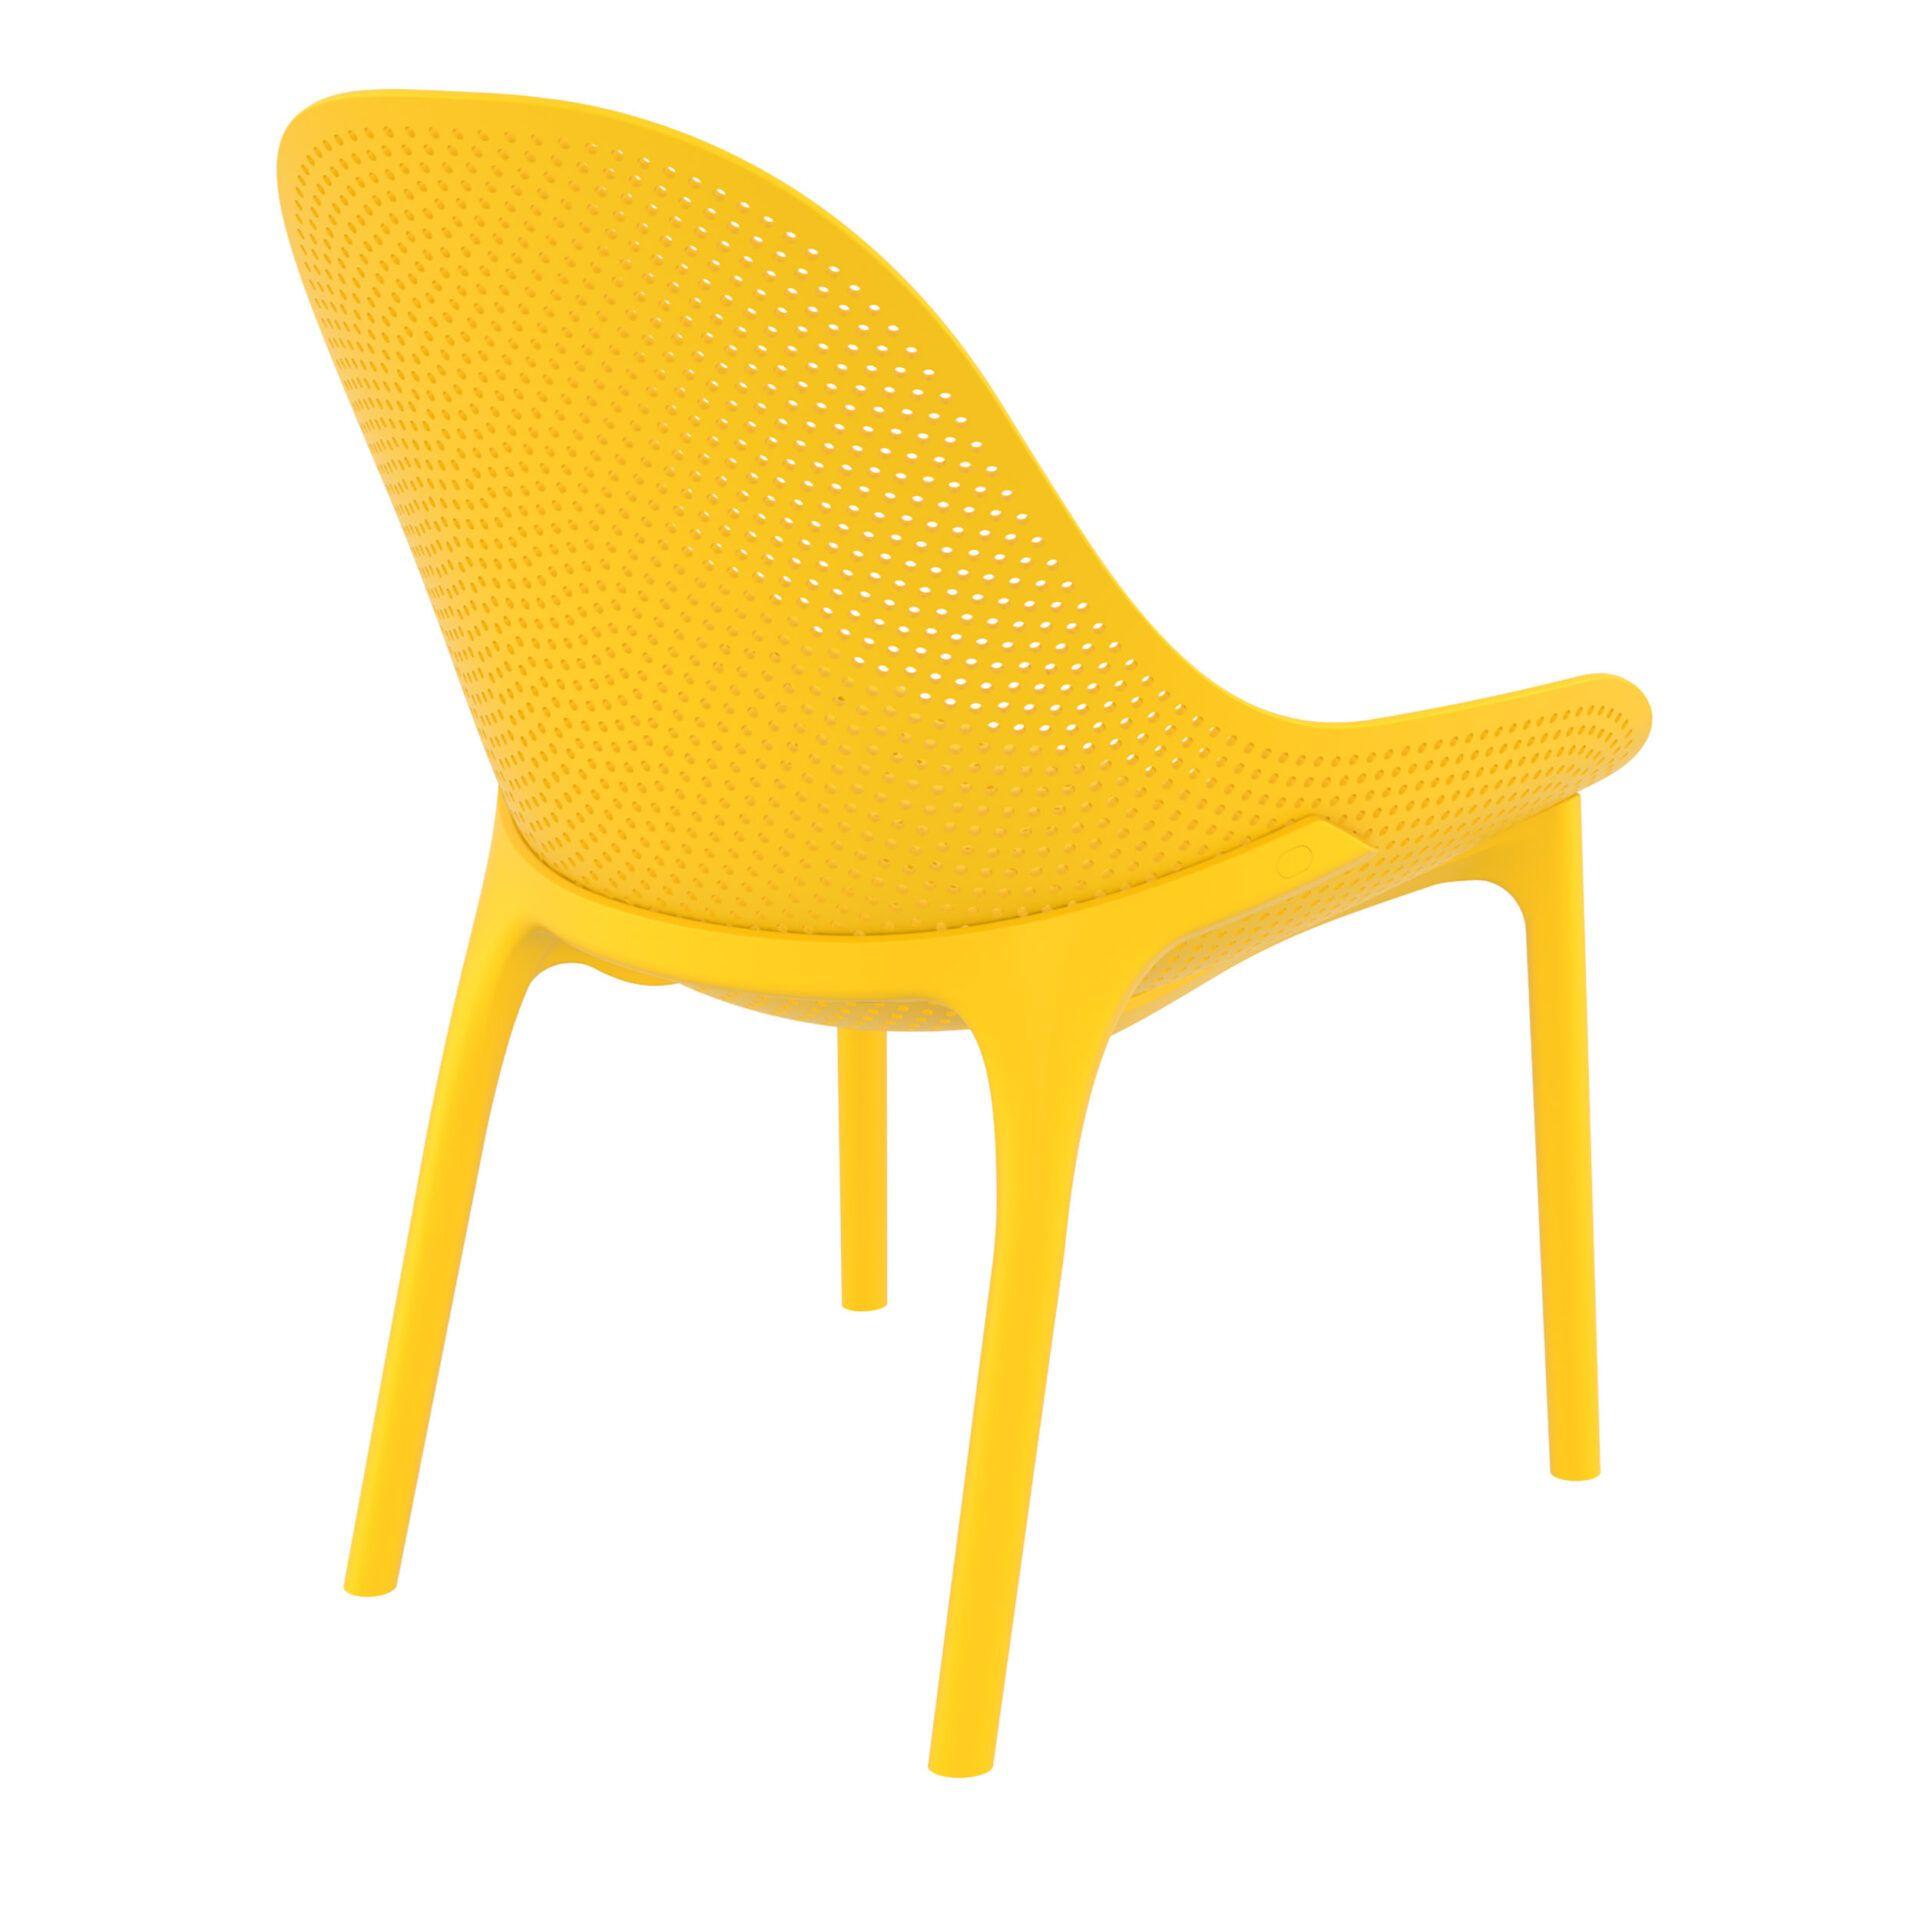 outdoor seating polypropylene sky lounge yellow back side